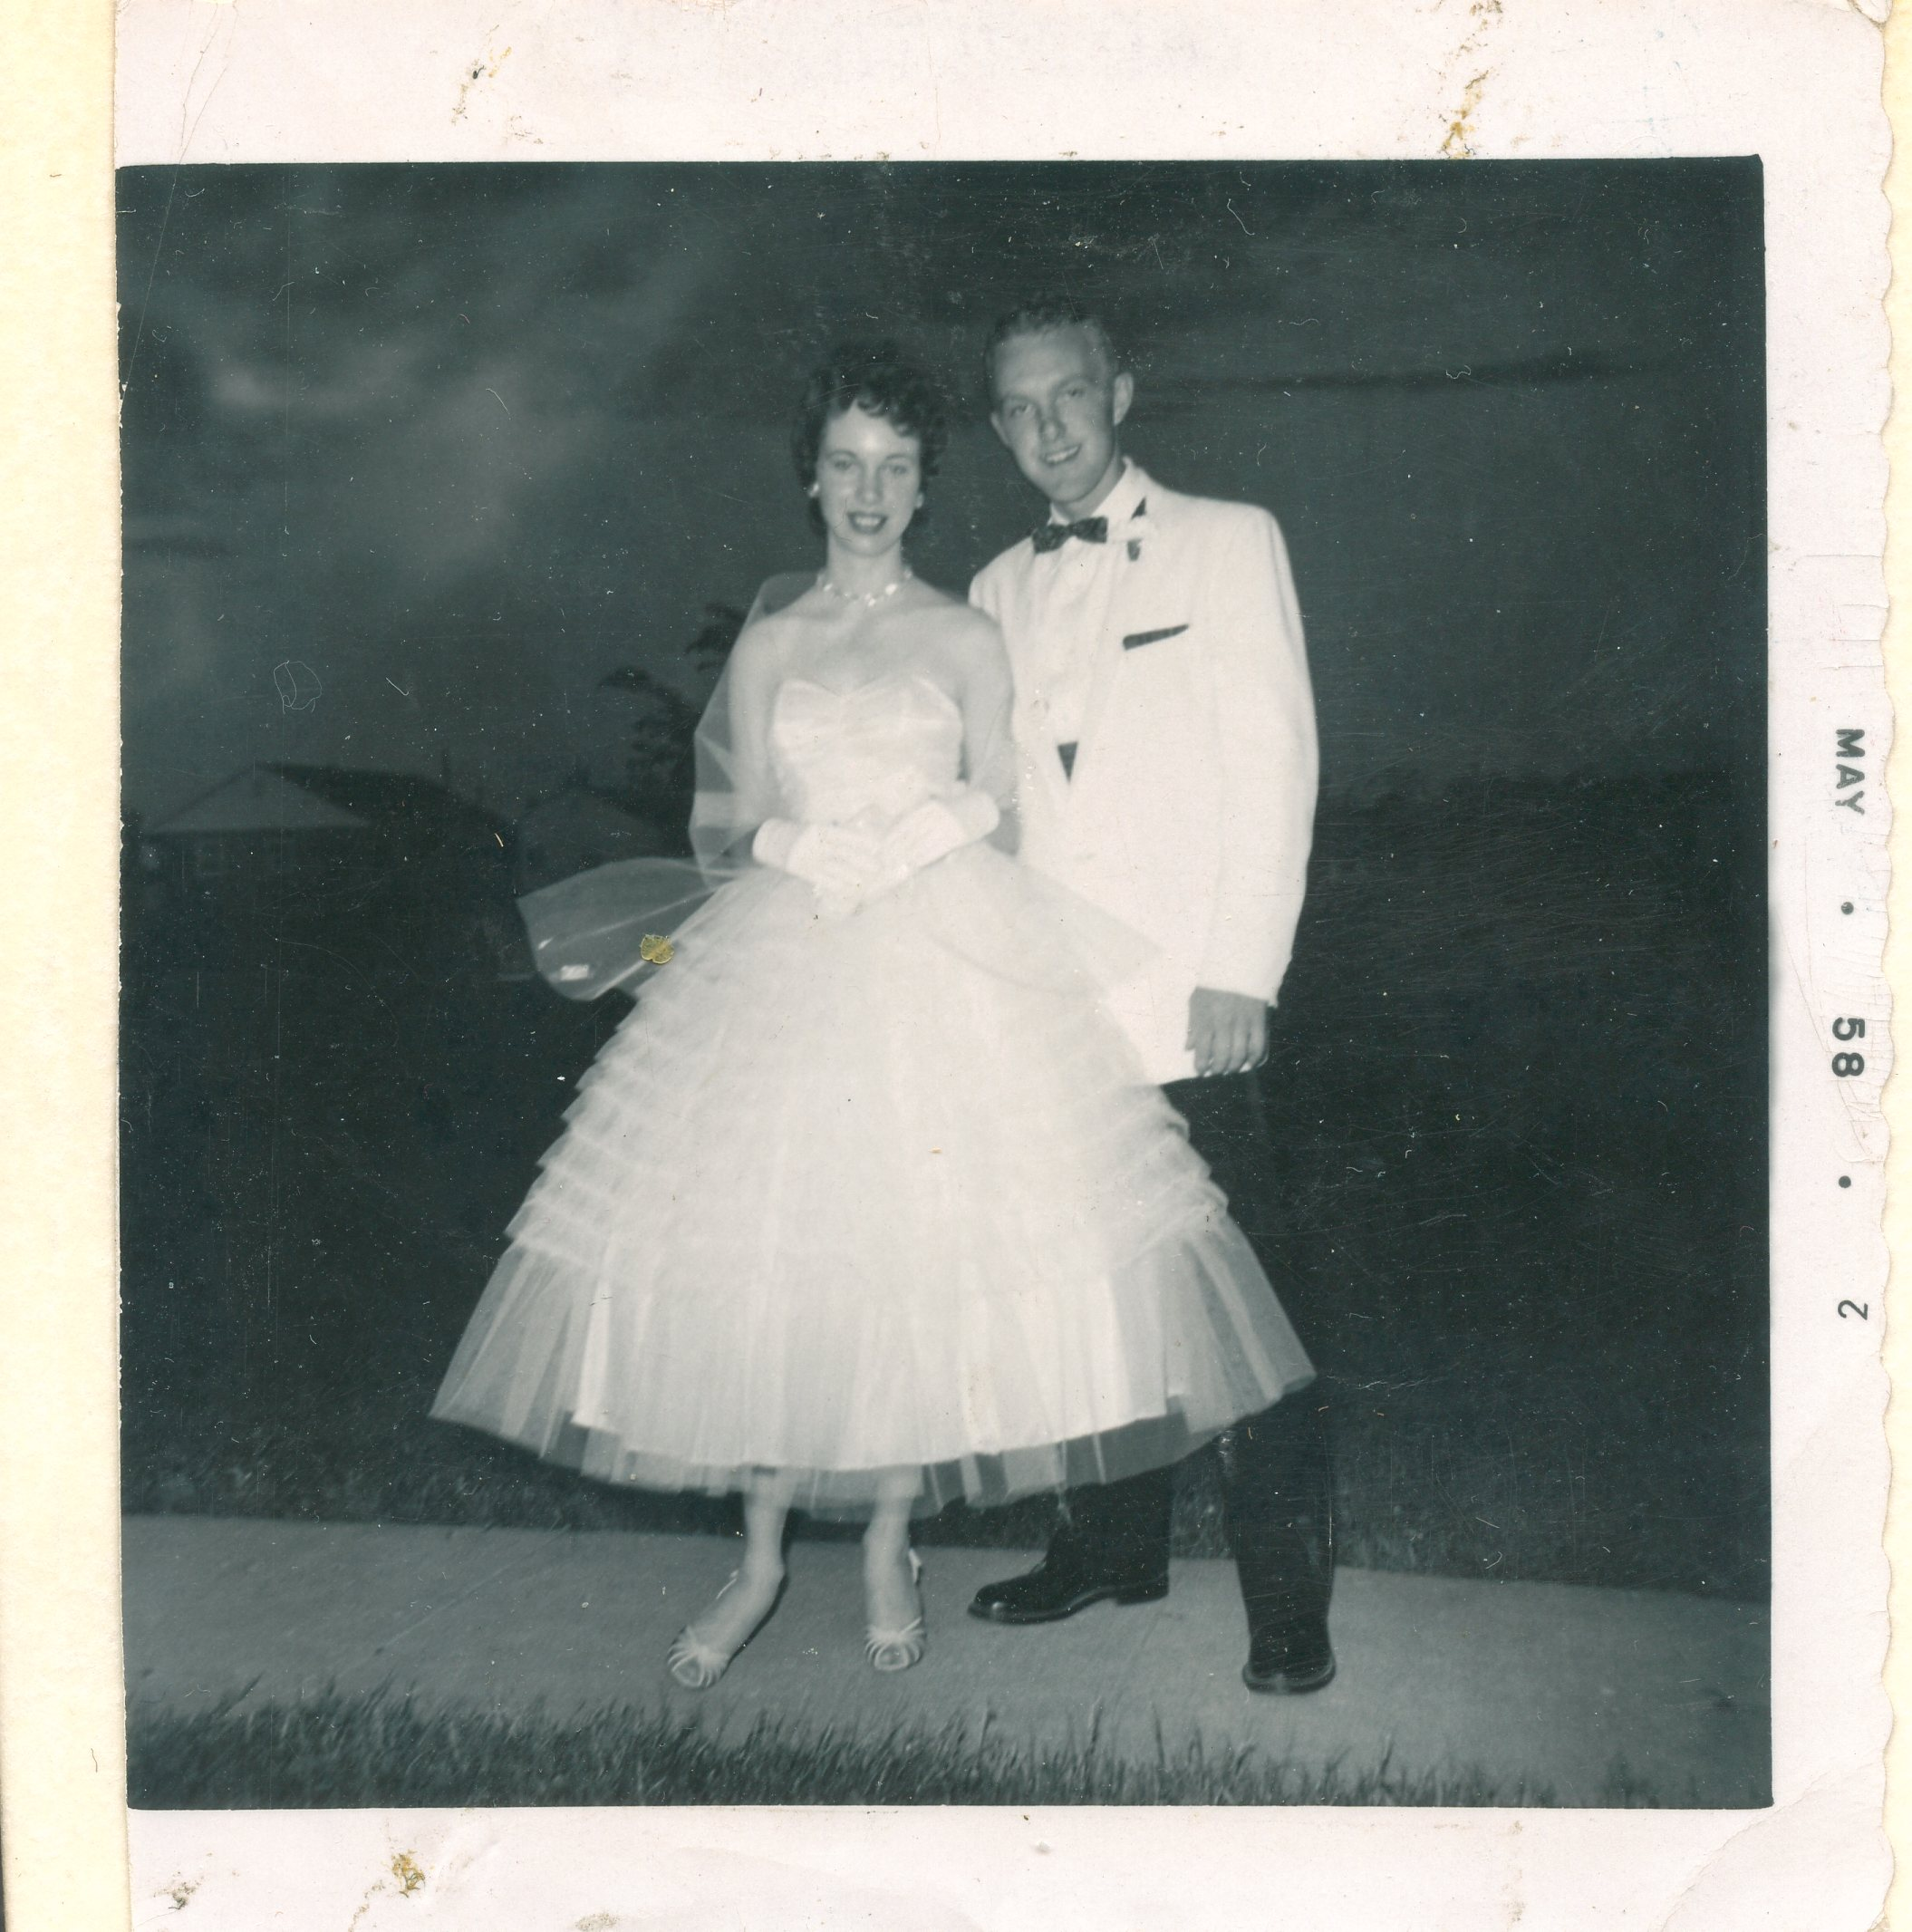 Alexander Springer and Dawn Ryman, May 1958.